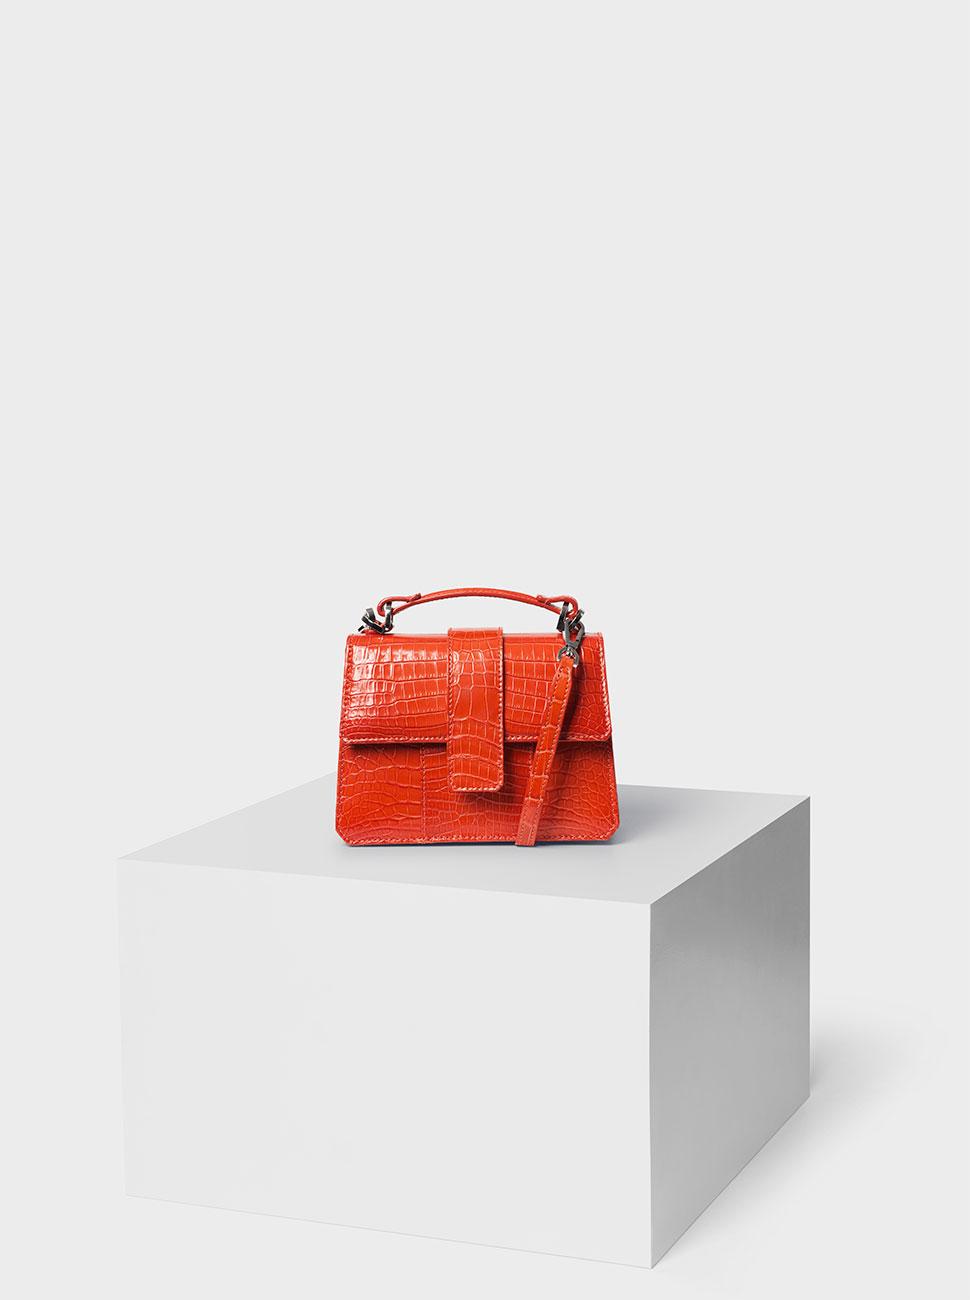 The M2 crocodile bag orange